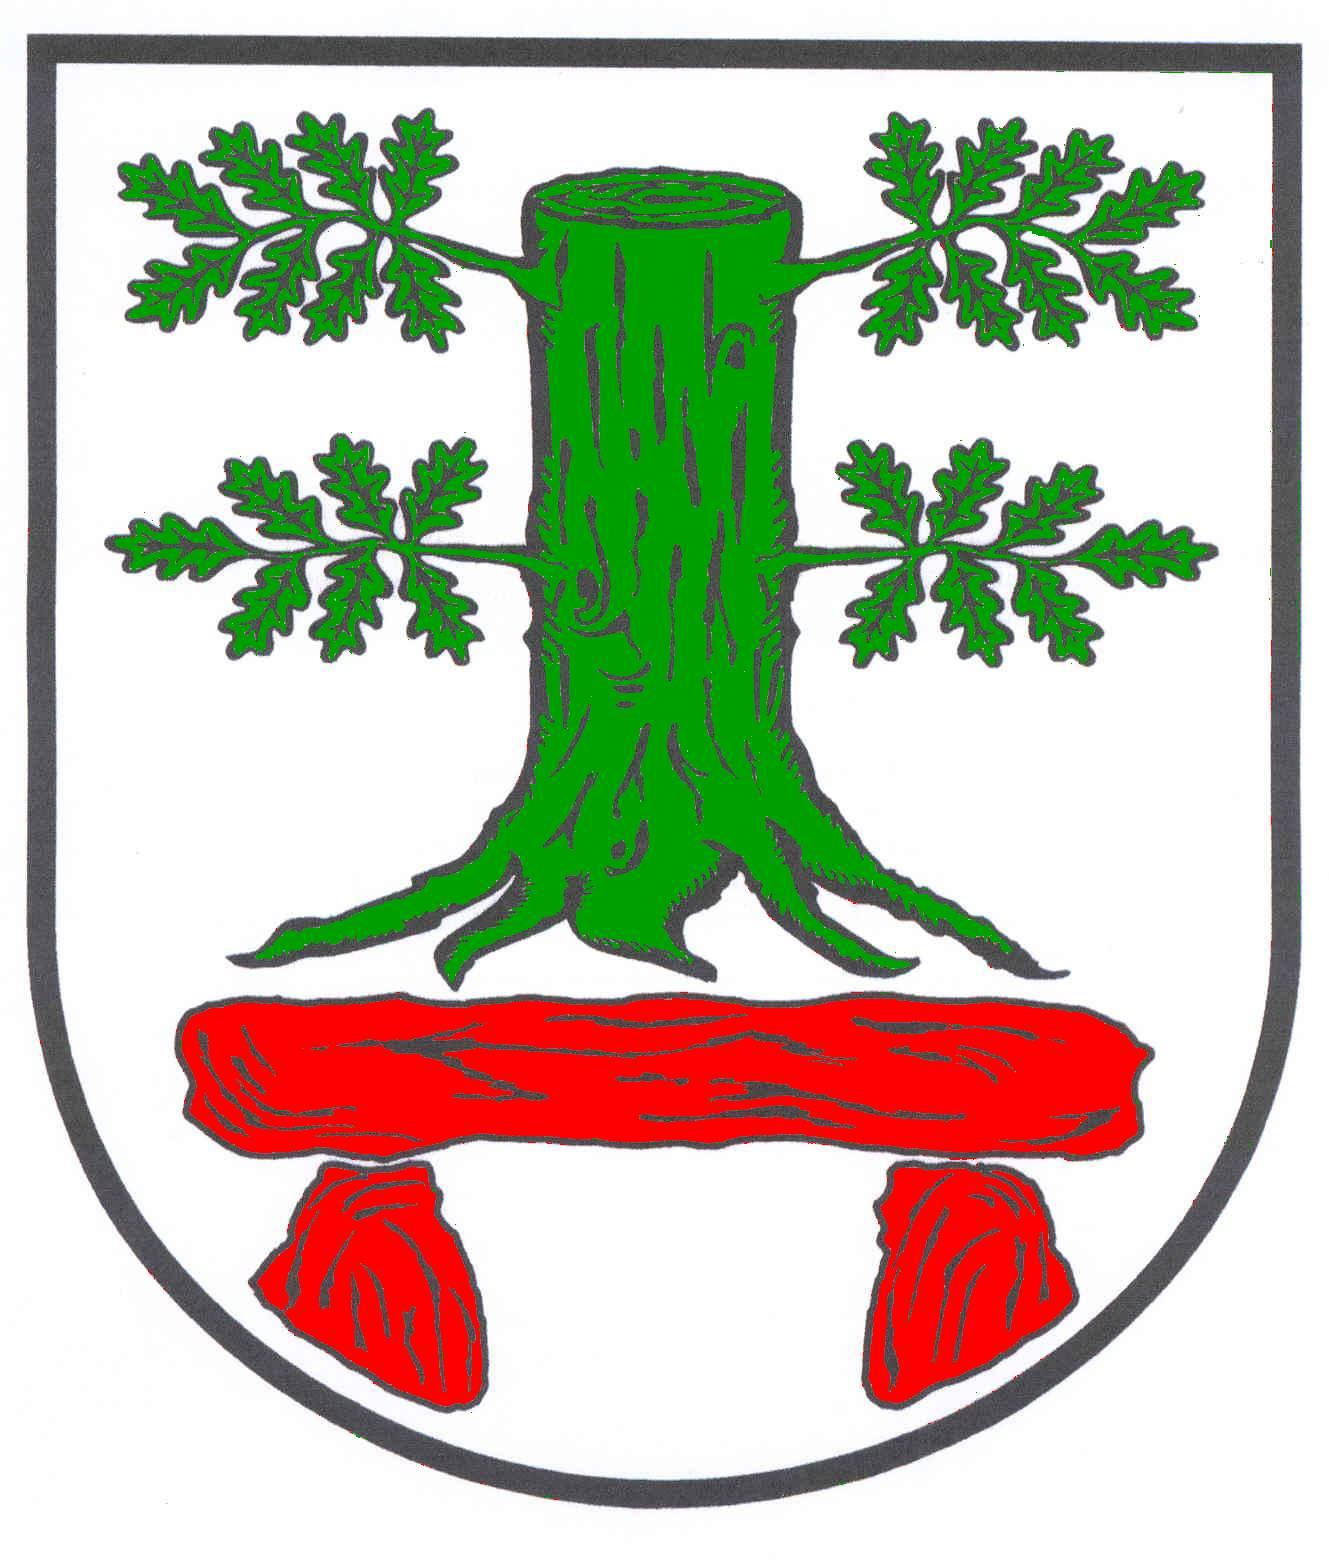 Wappen GemeindeKöhn, Kreis Plön